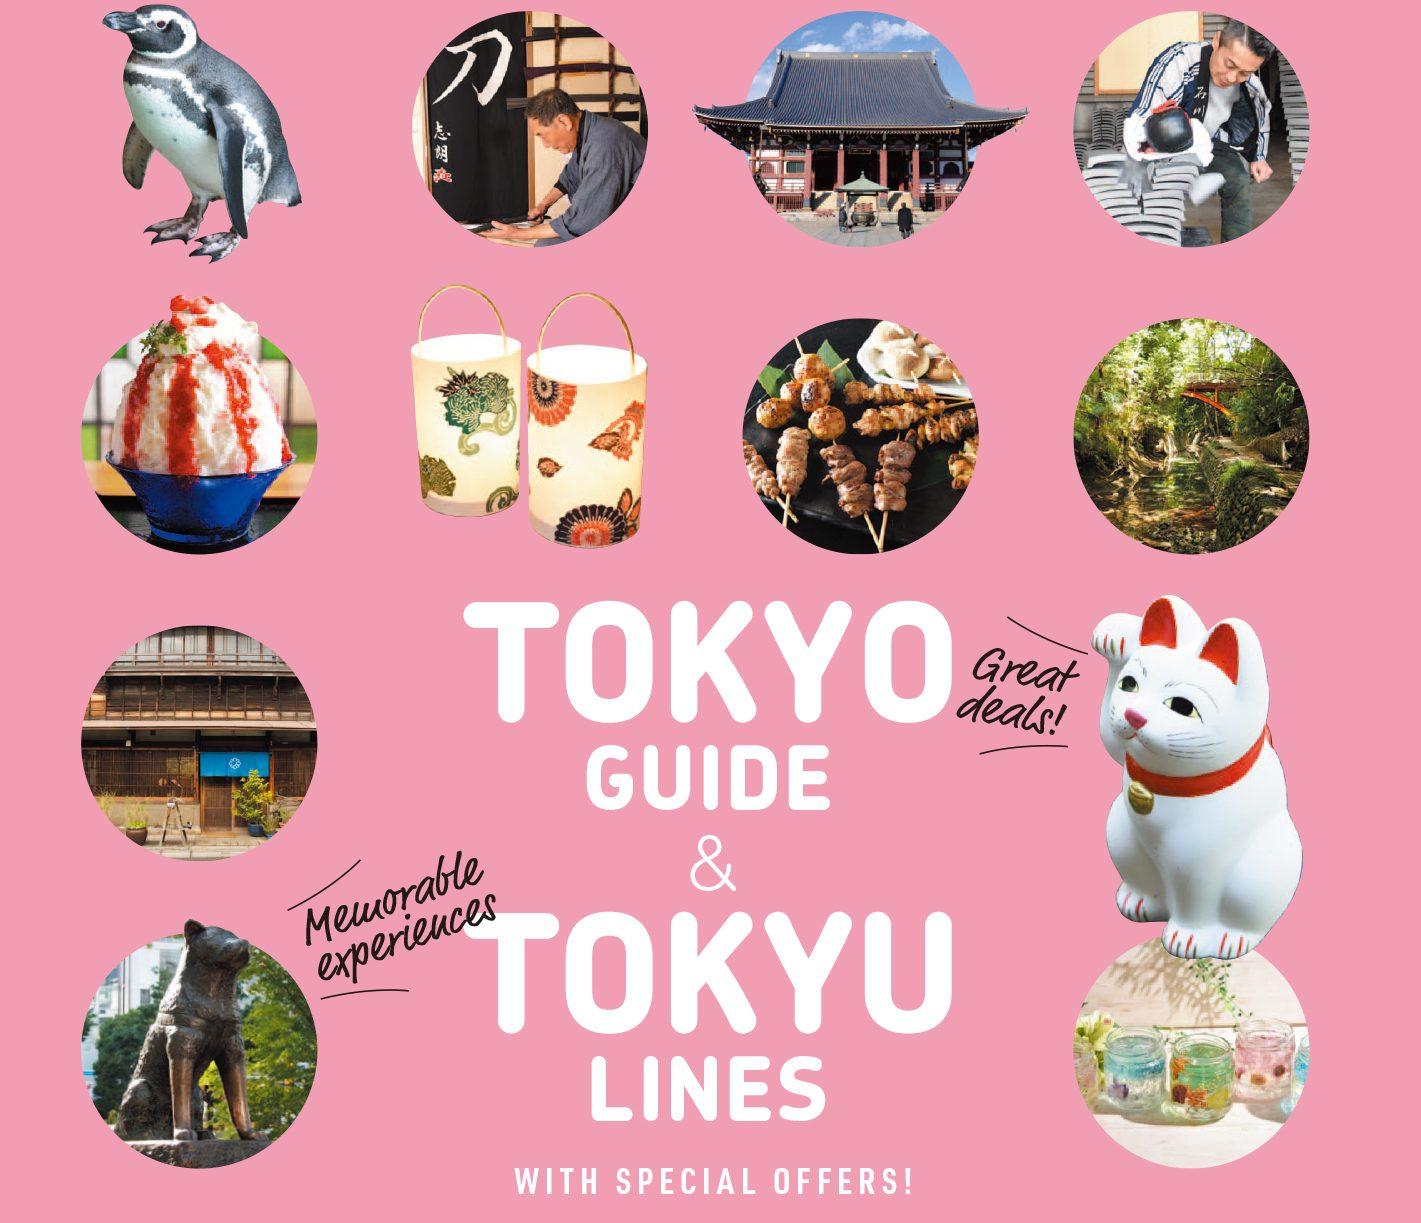 TOKYO GUIDE & TOKYU LINES_1